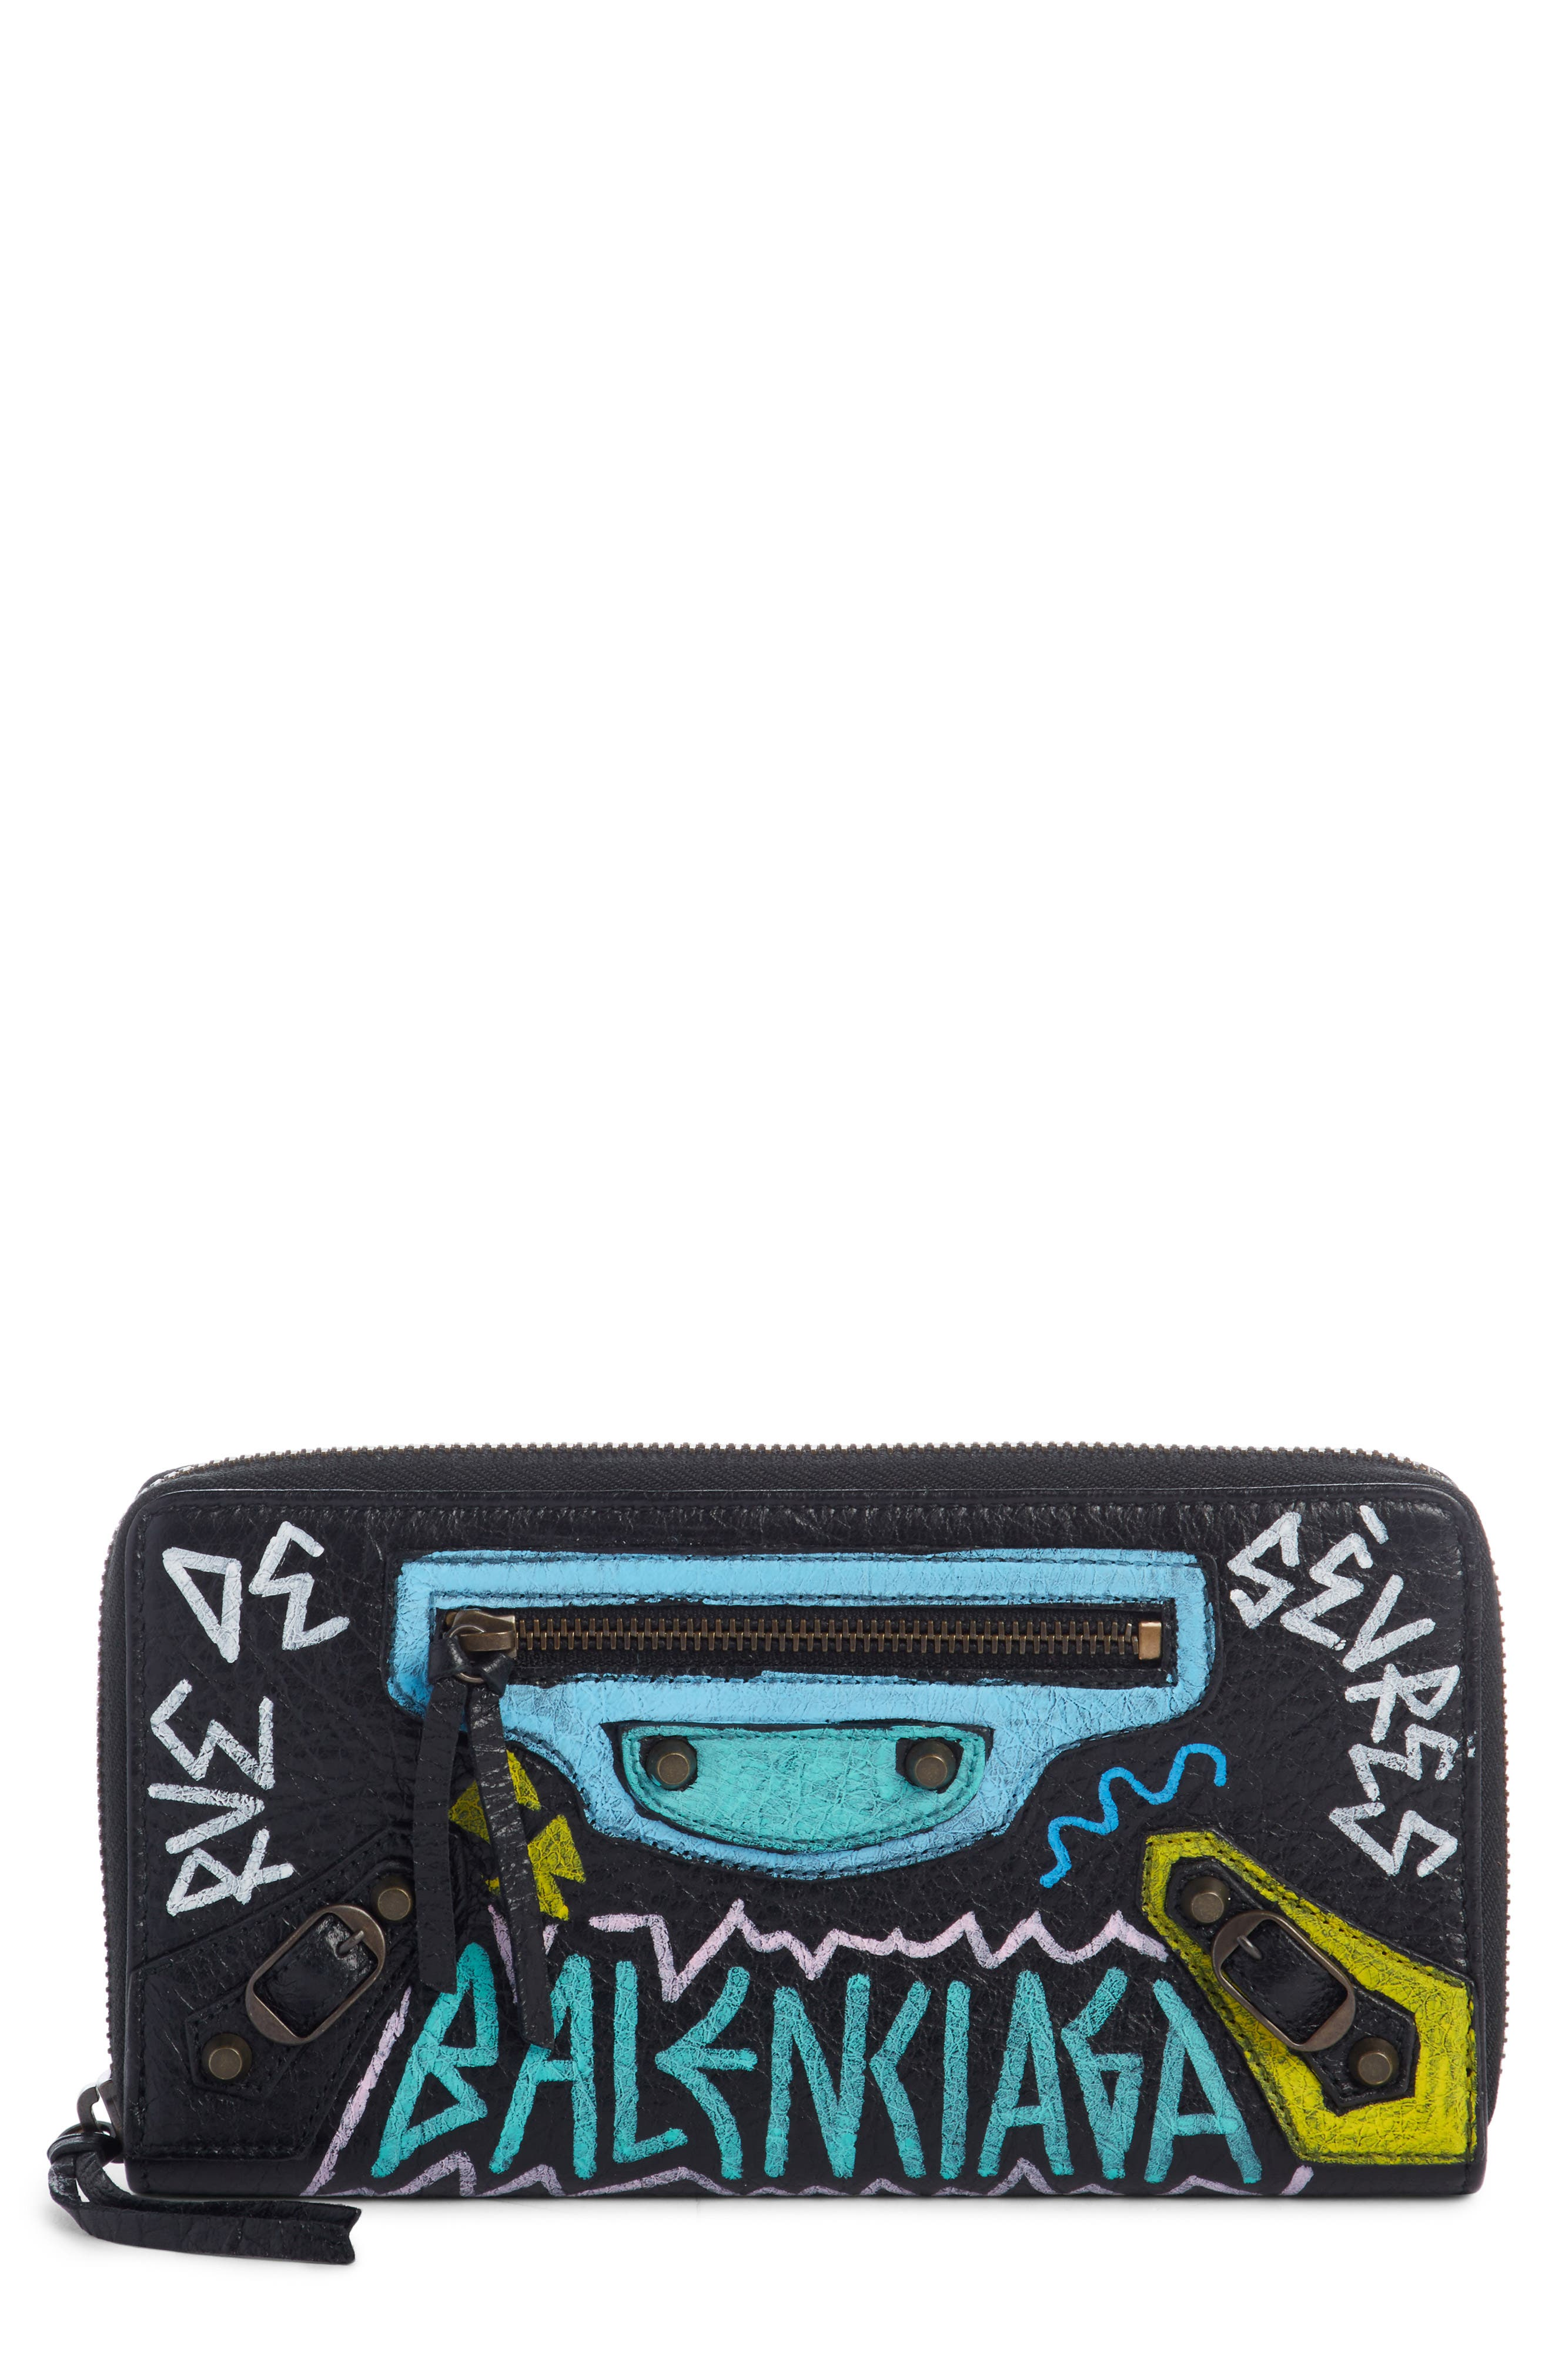 Balenciaga Classic Graffiti Zip Around Calfskin Leather Wallet